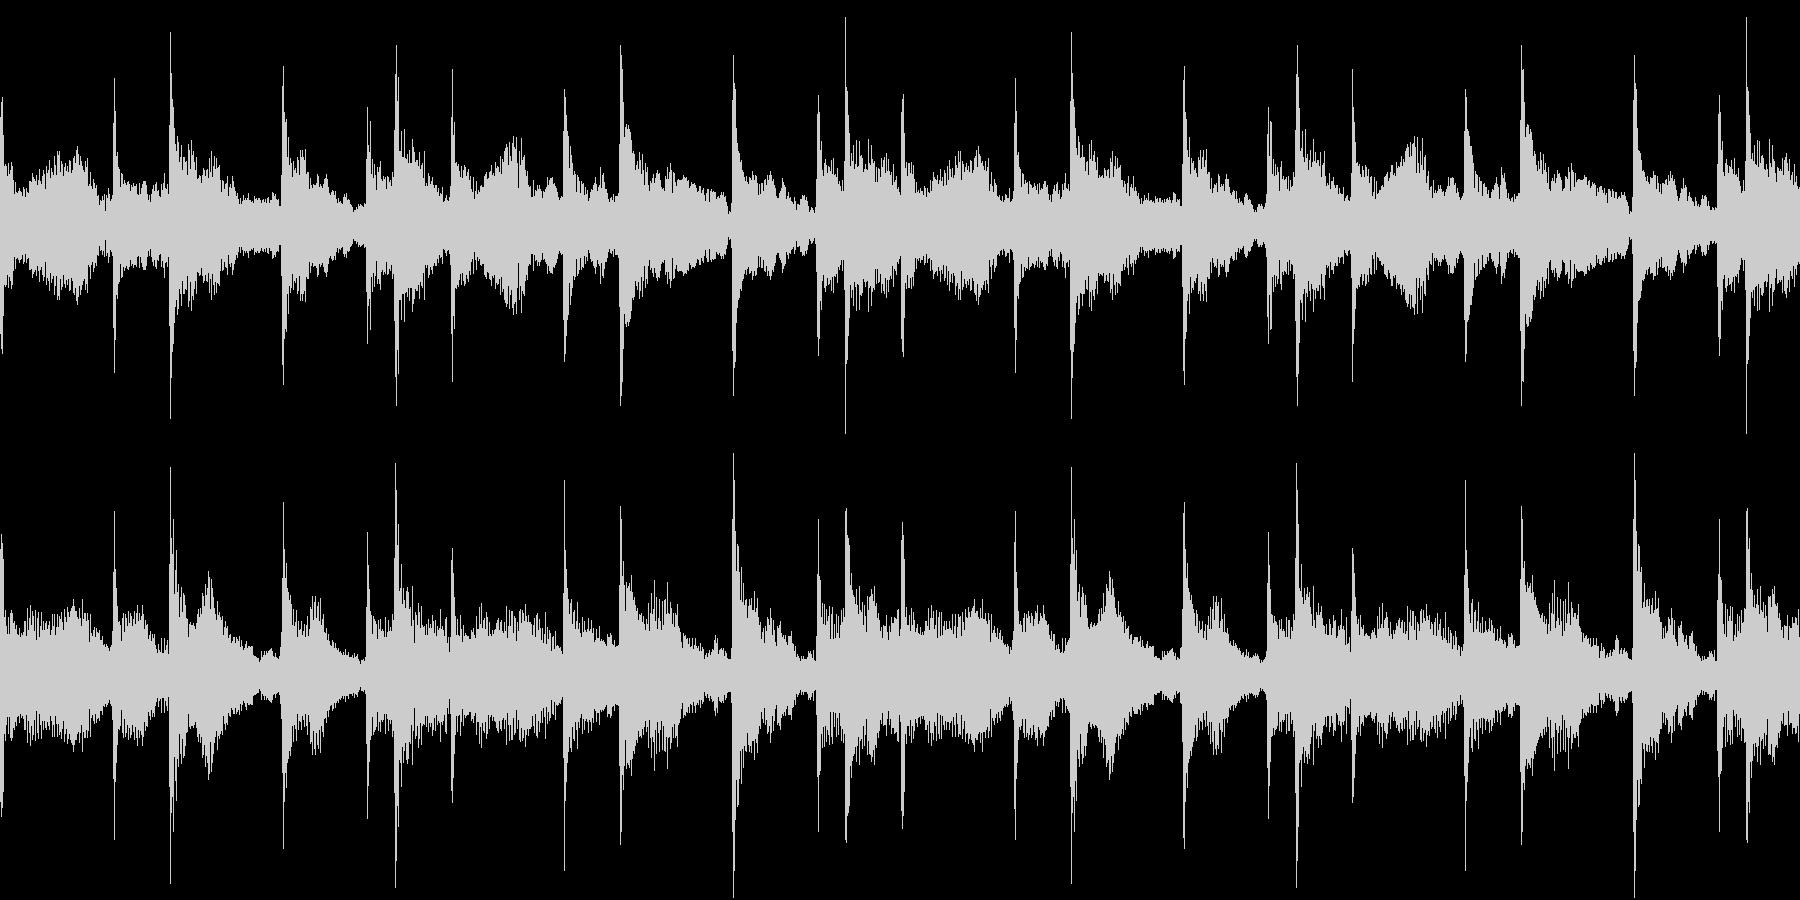 House コードシンセ 4 音楽制作用の未再生の波形